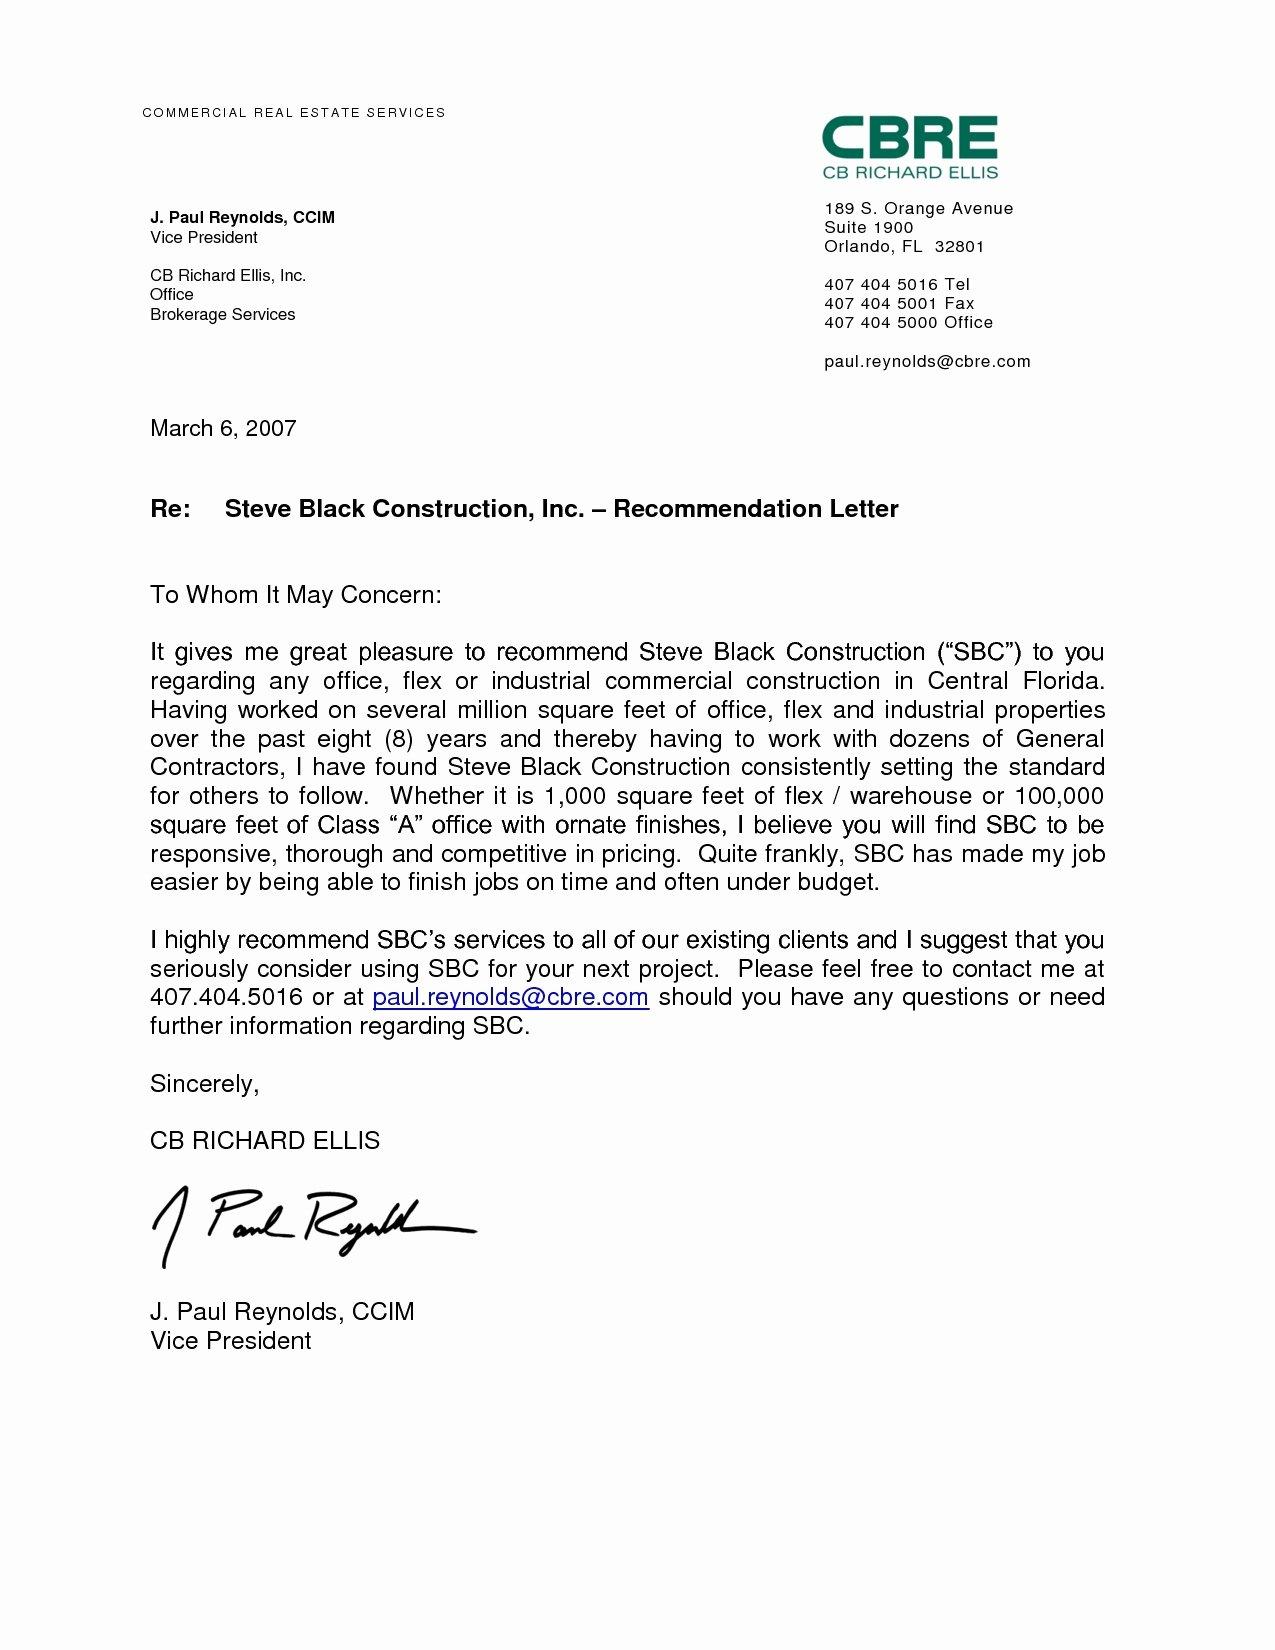 Work Re Mendation Letter Sample